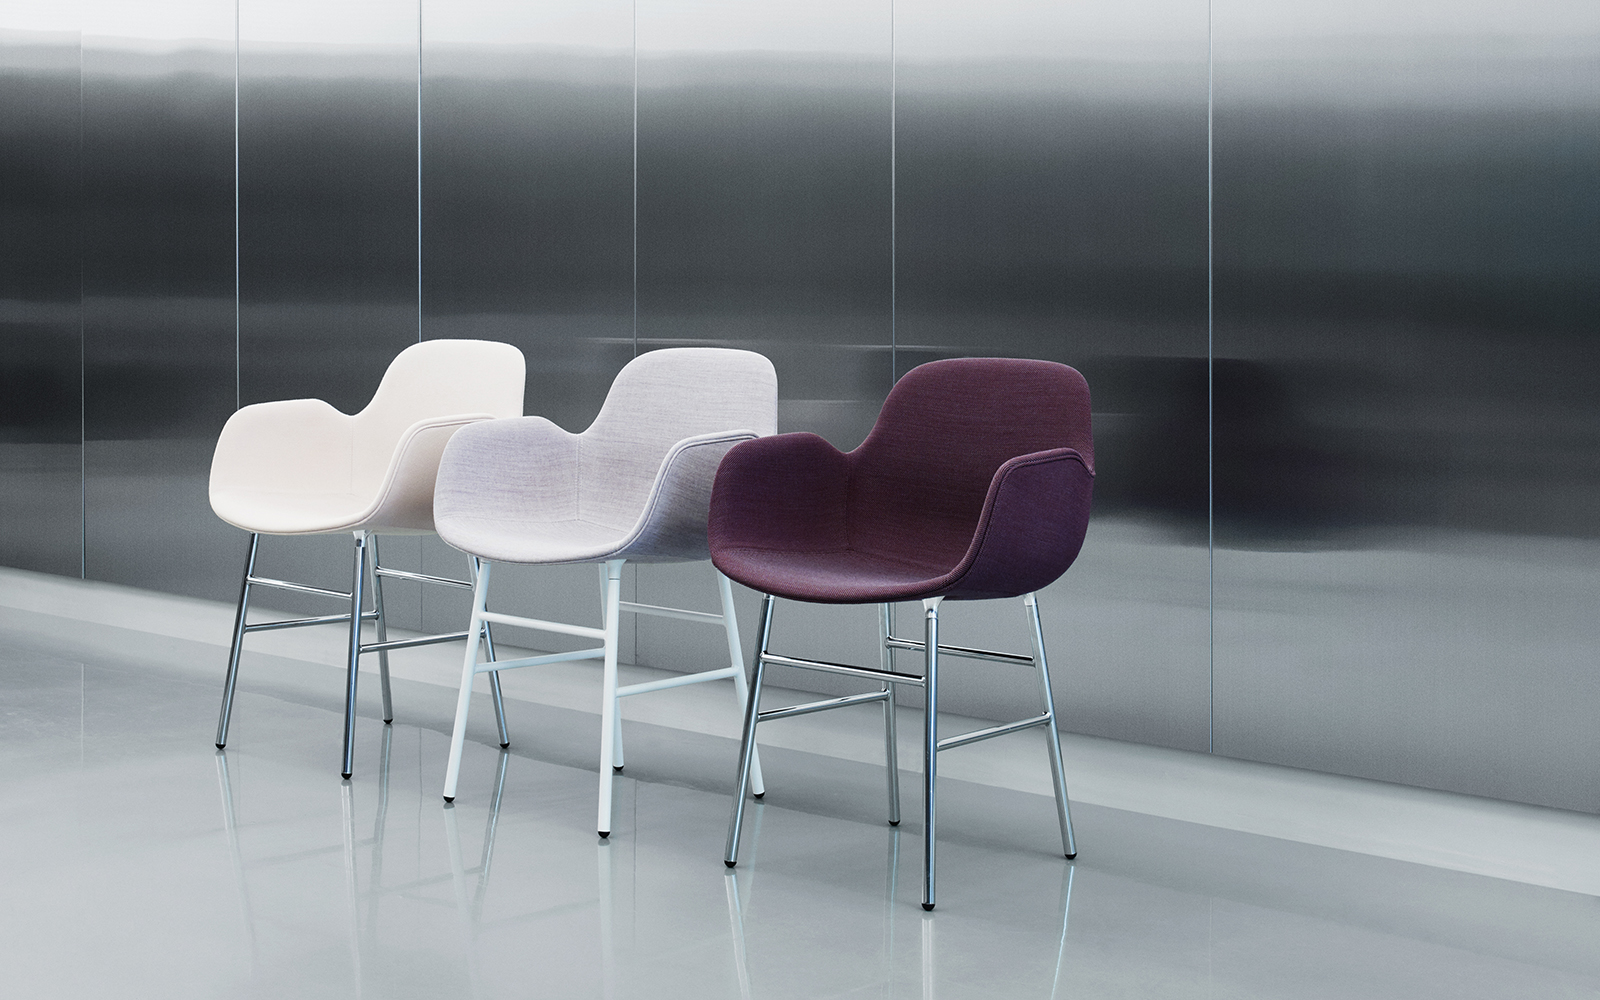 Astounding Customize Form Chair Full Upholstery Creativecarmelina Interior Chair Design Creativecarmelinacom